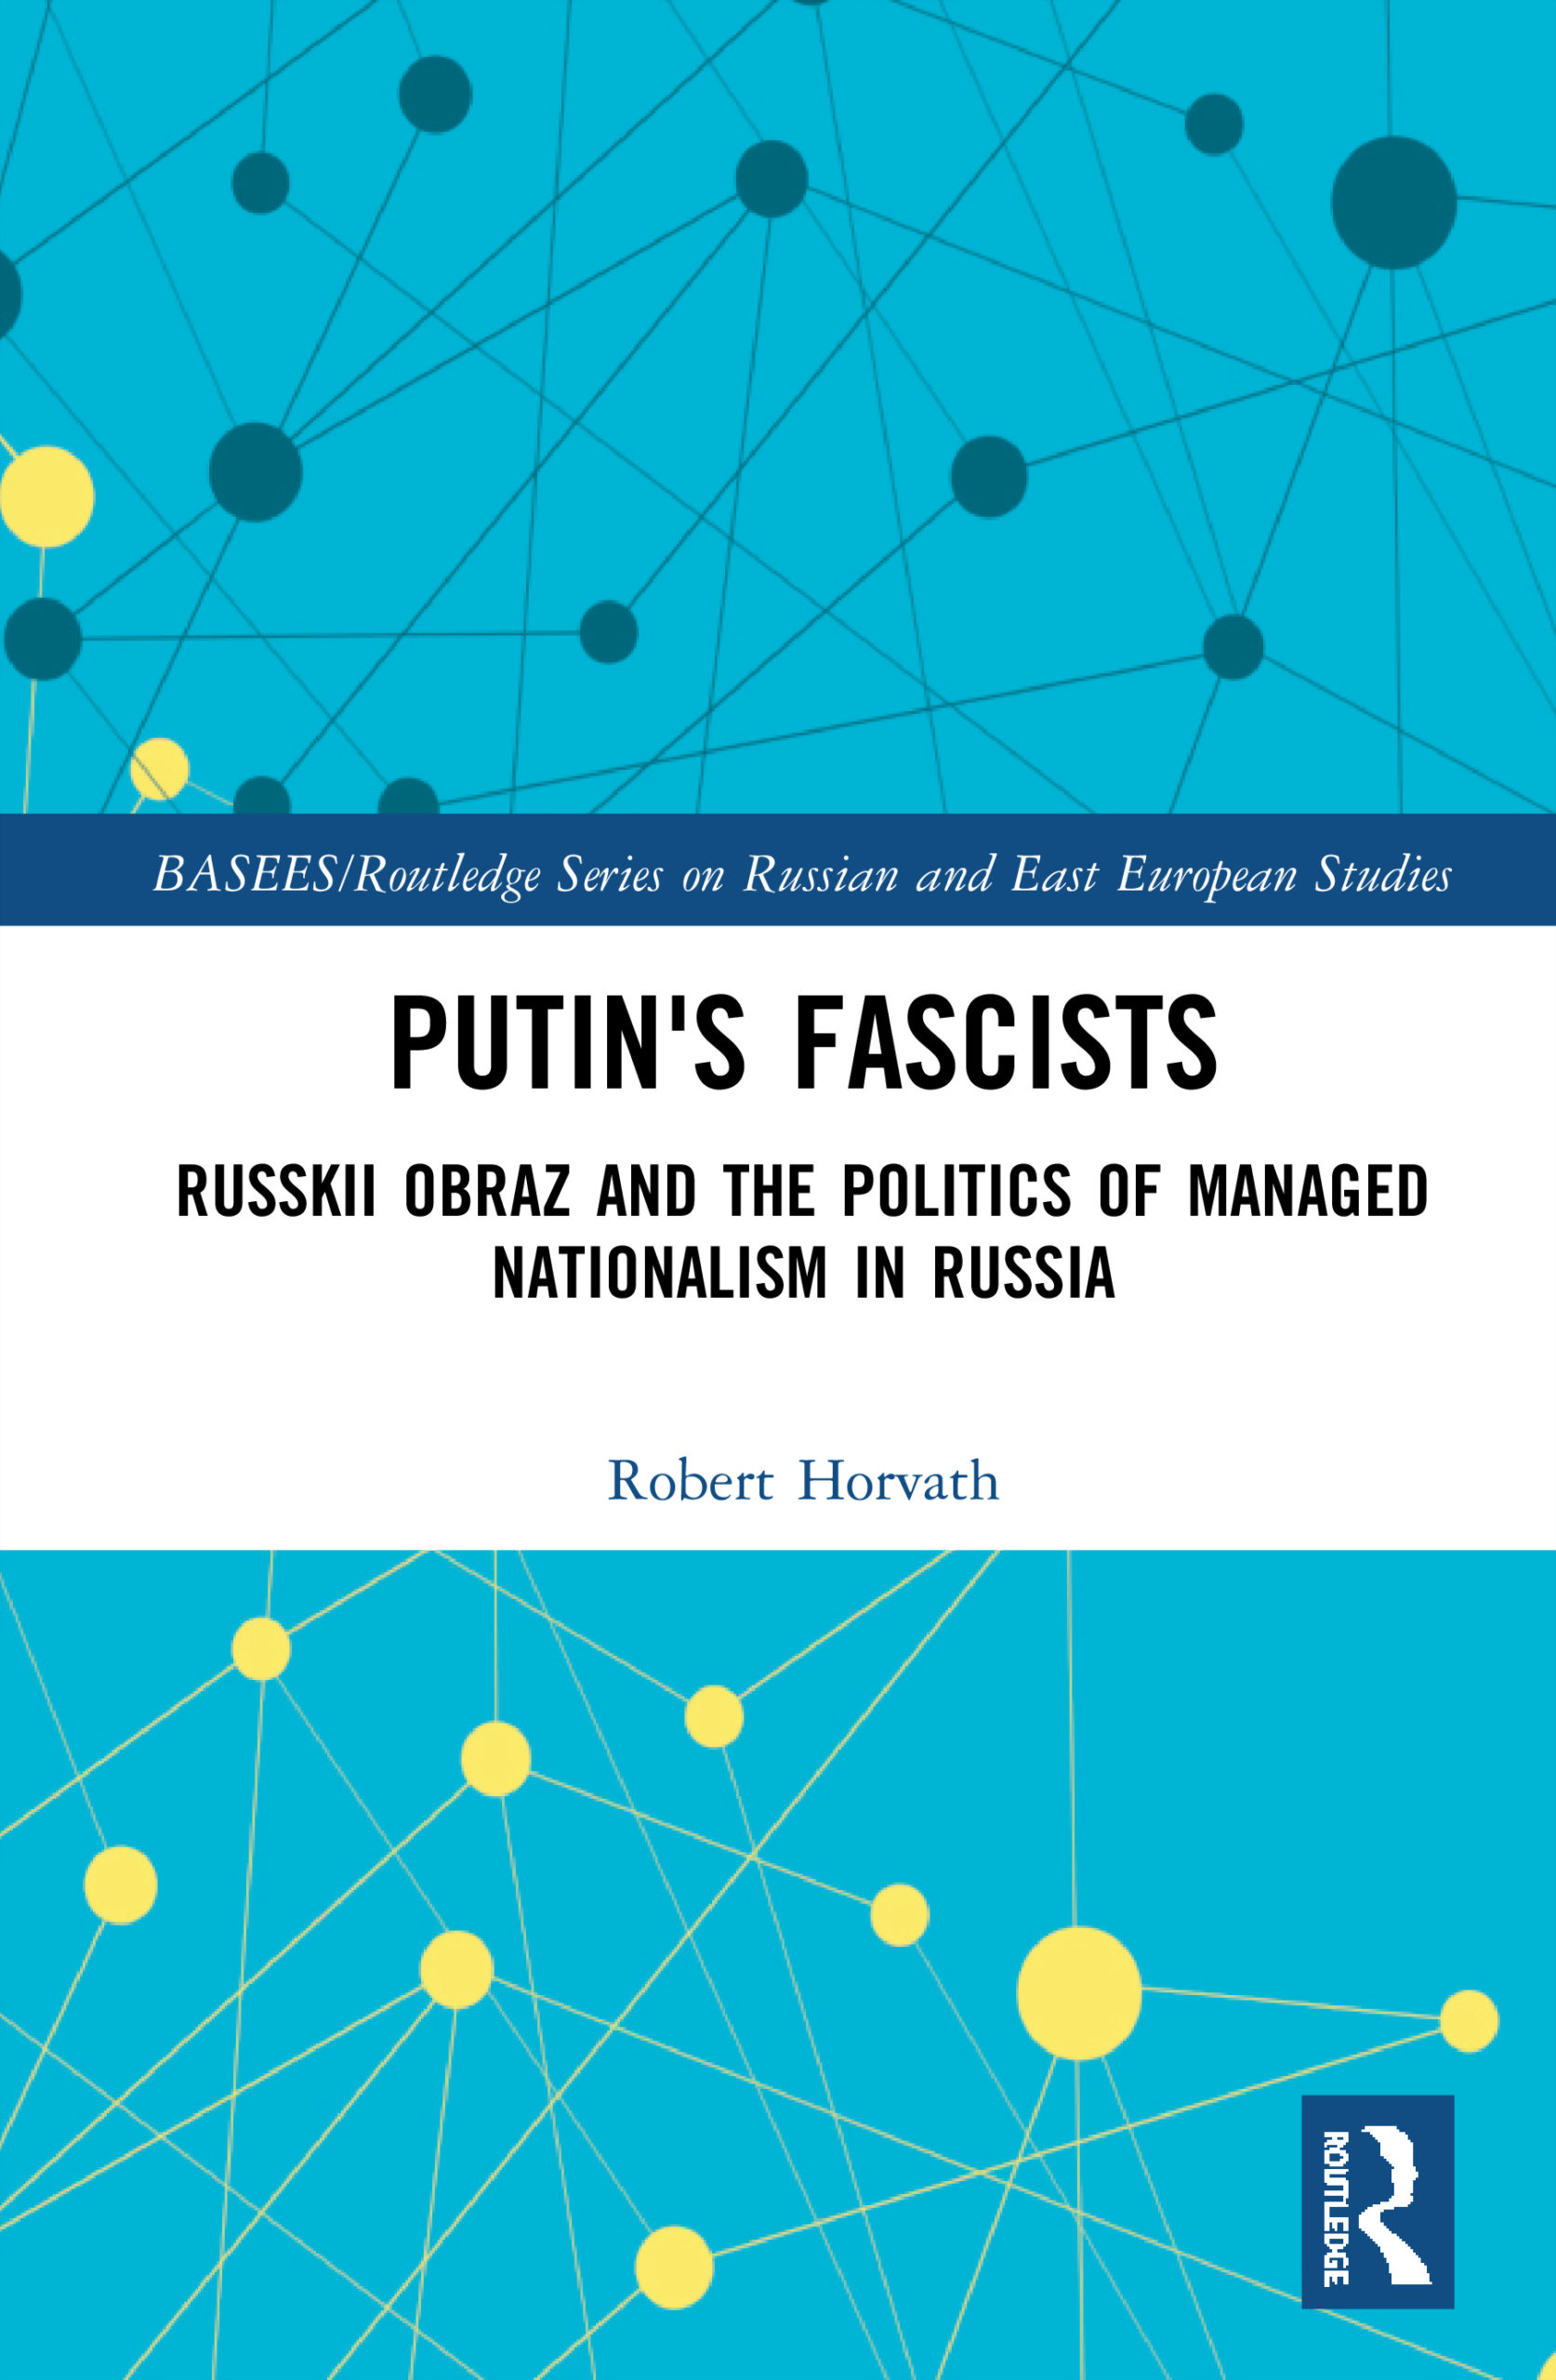 Putin's Fascists. Russkii Obraz and the Politics ofManaged Nationalism inRussia